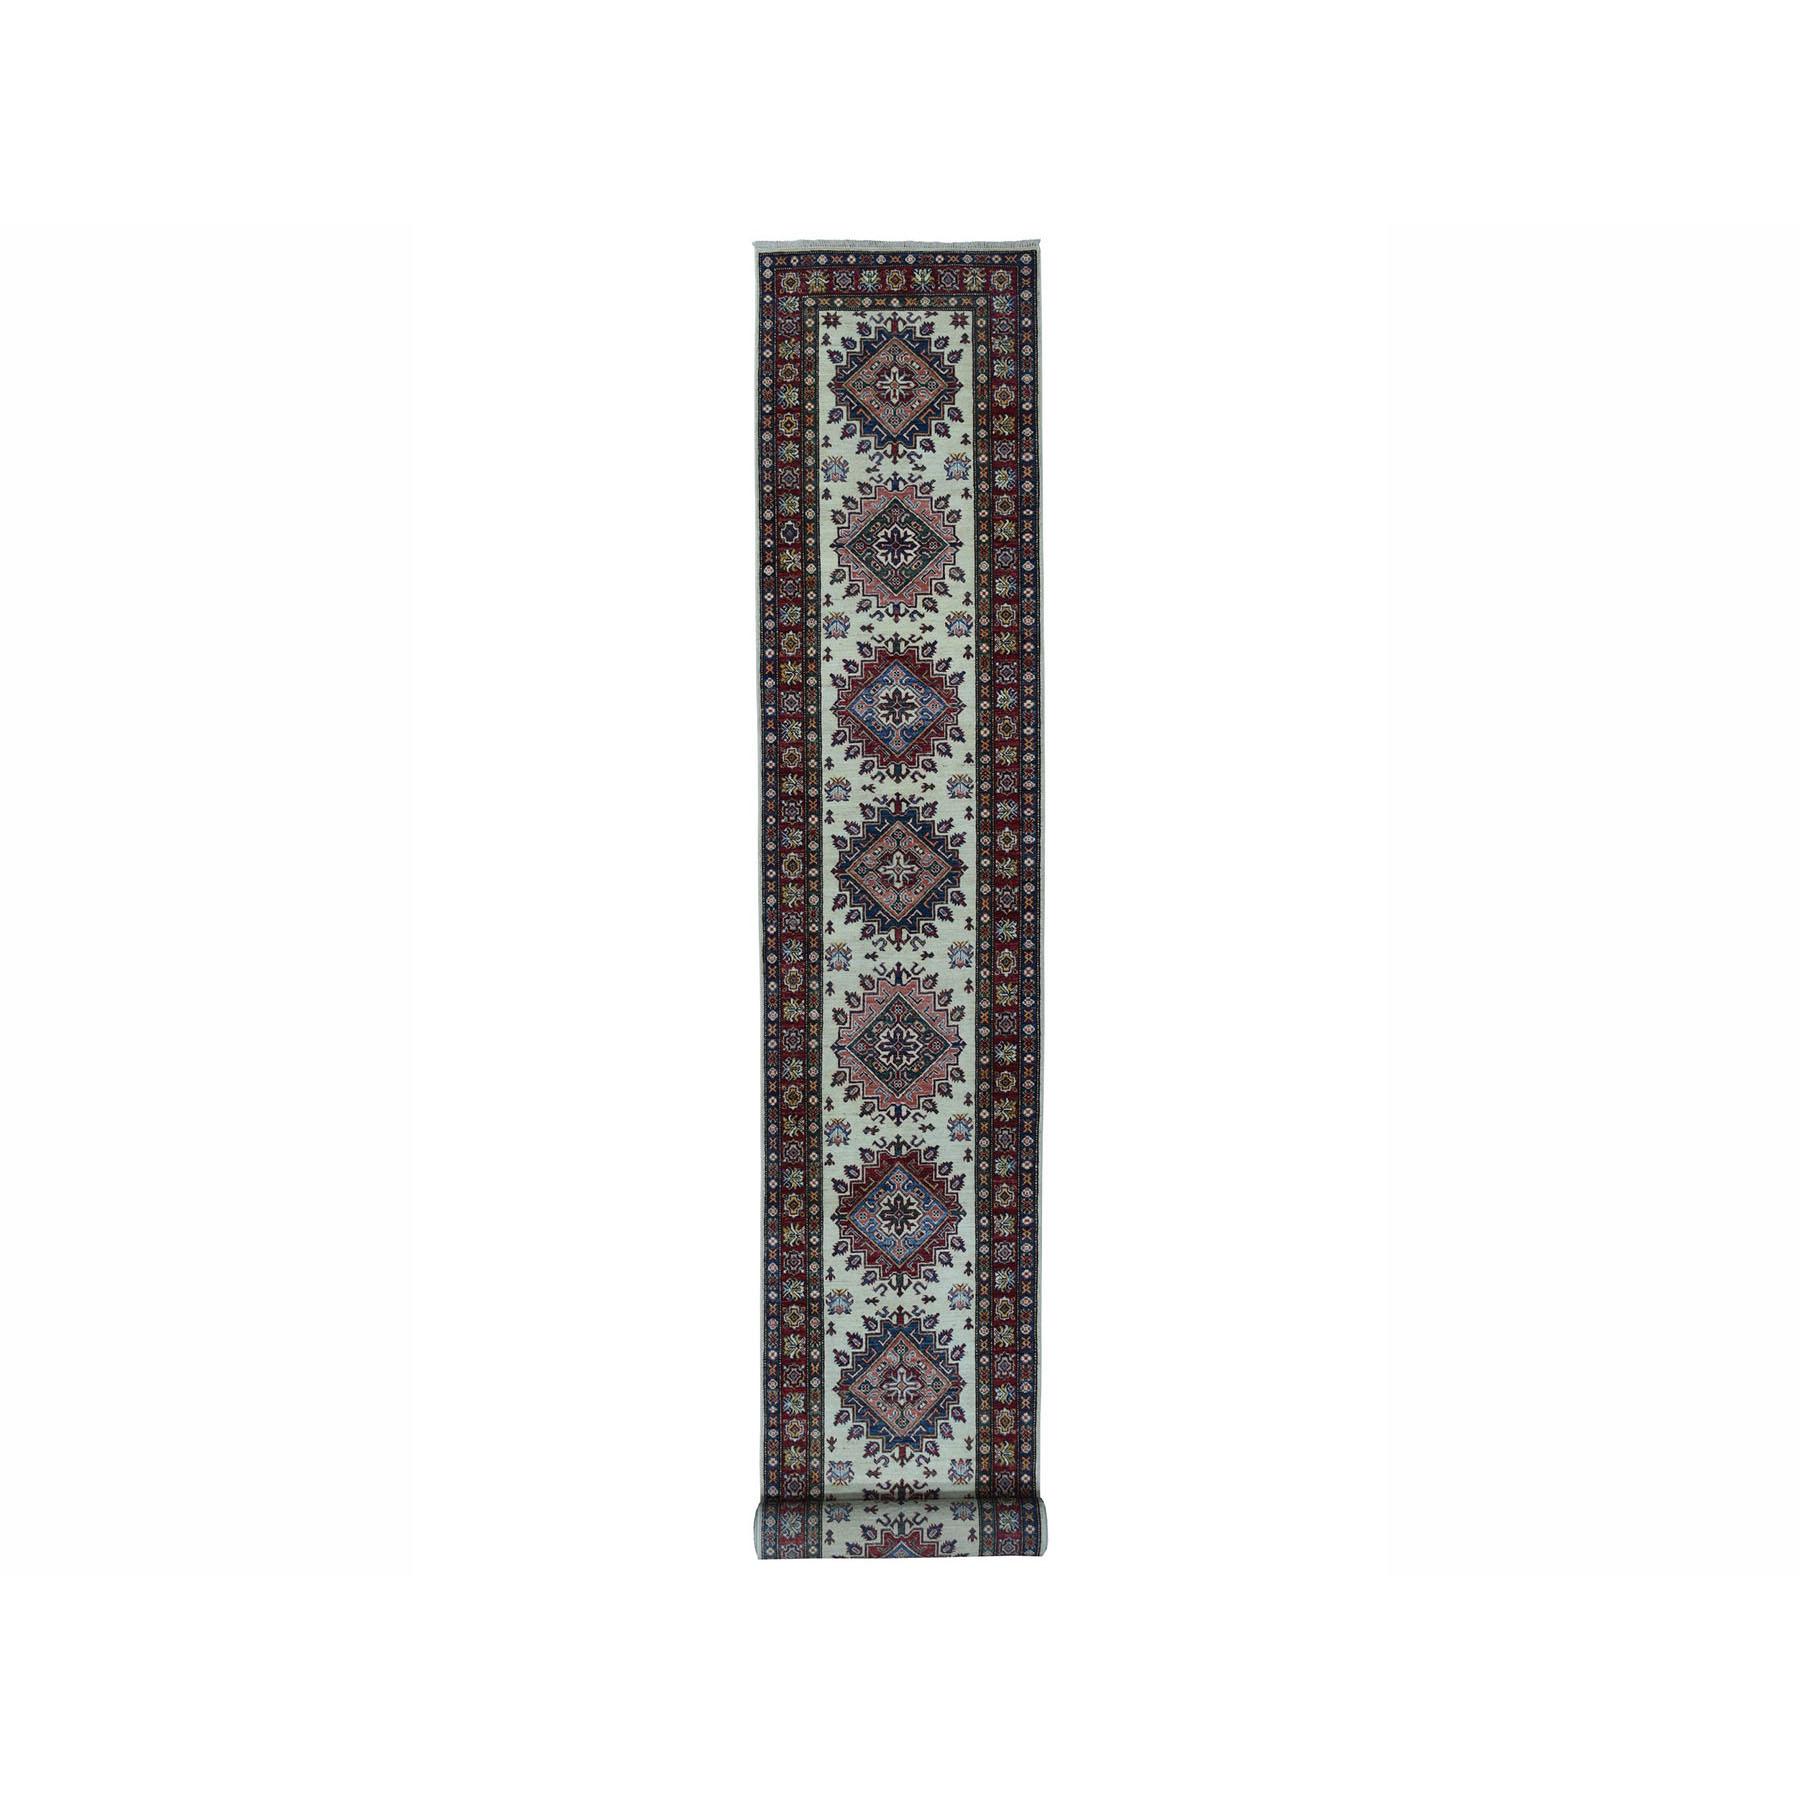 "2'9""X19'1"" Ivory Super Kazak Geometric Design Hand-Knotted Xl Runner Oriental Rug moae0a87"